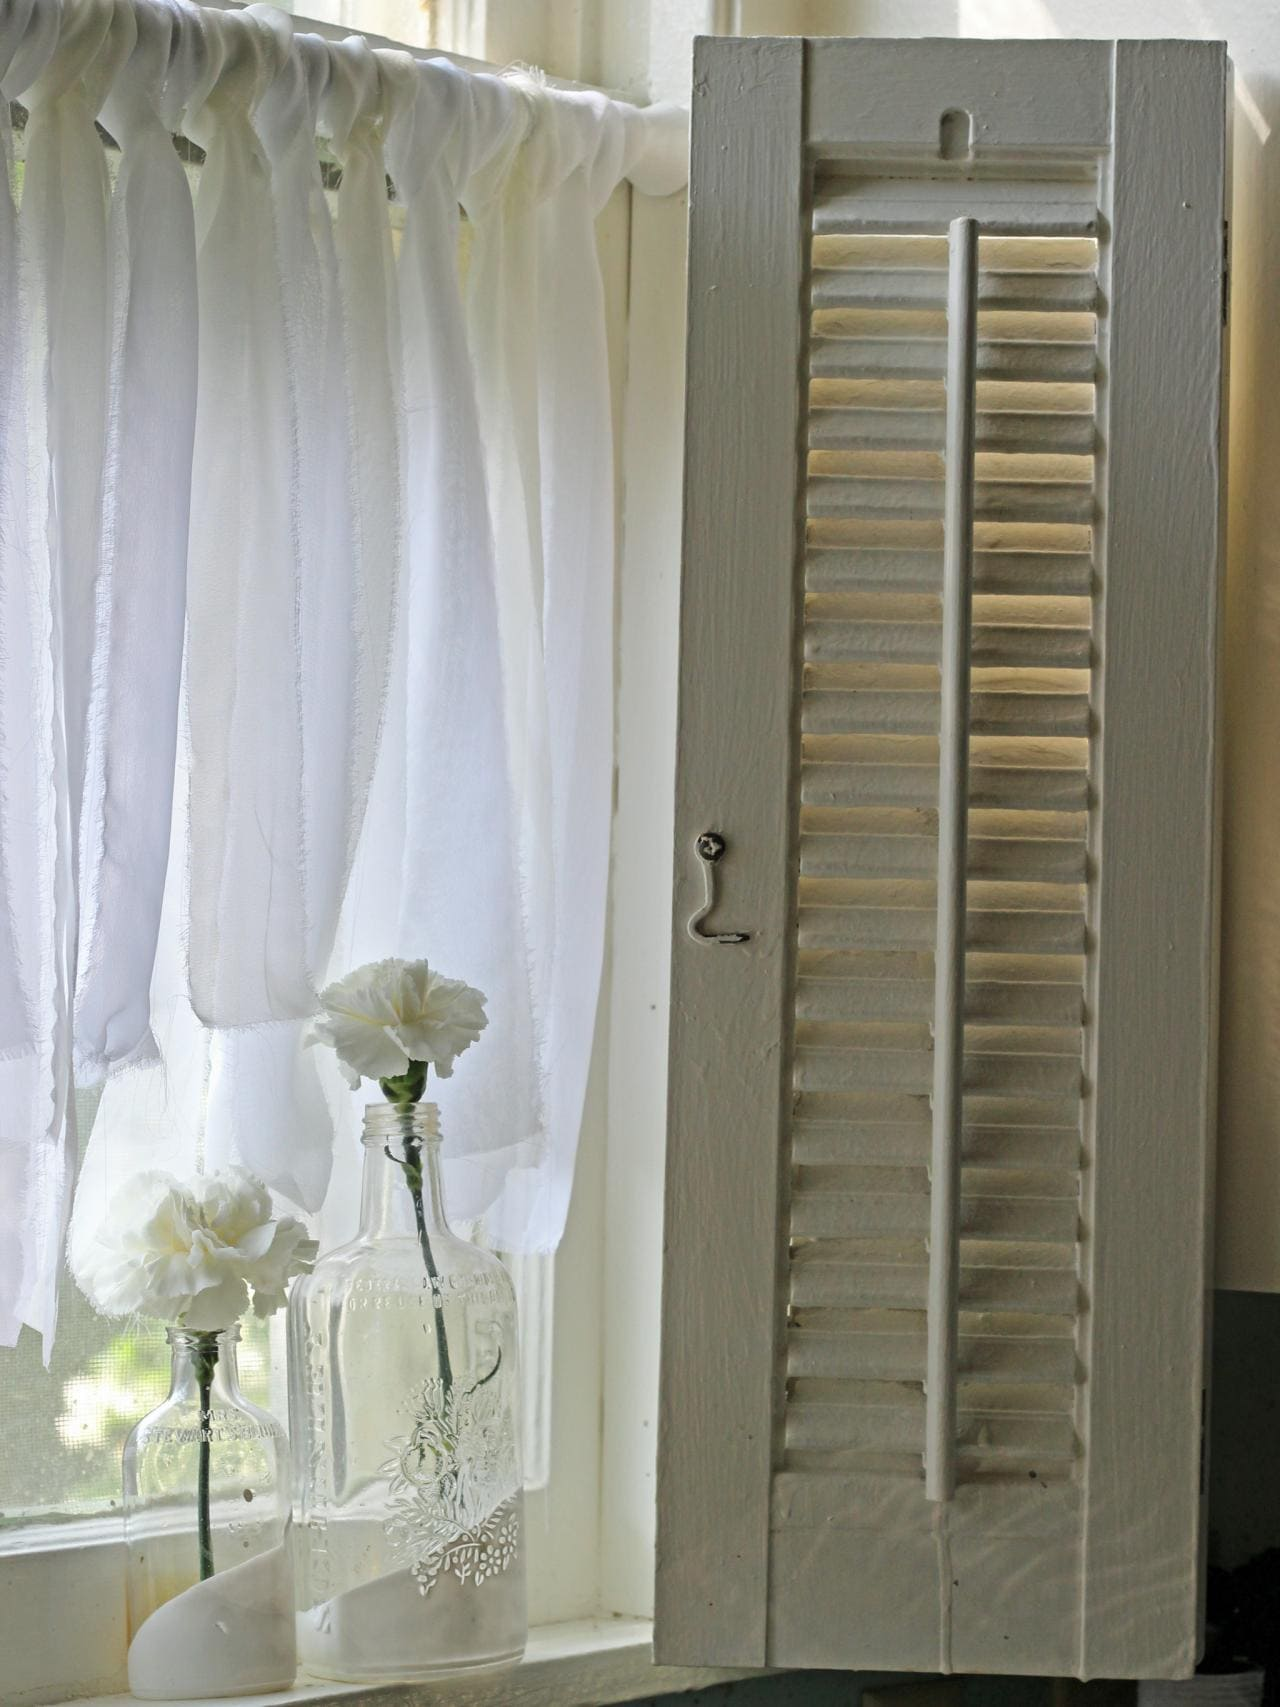 3.Simphome.com Knotted Chiffon Curtain